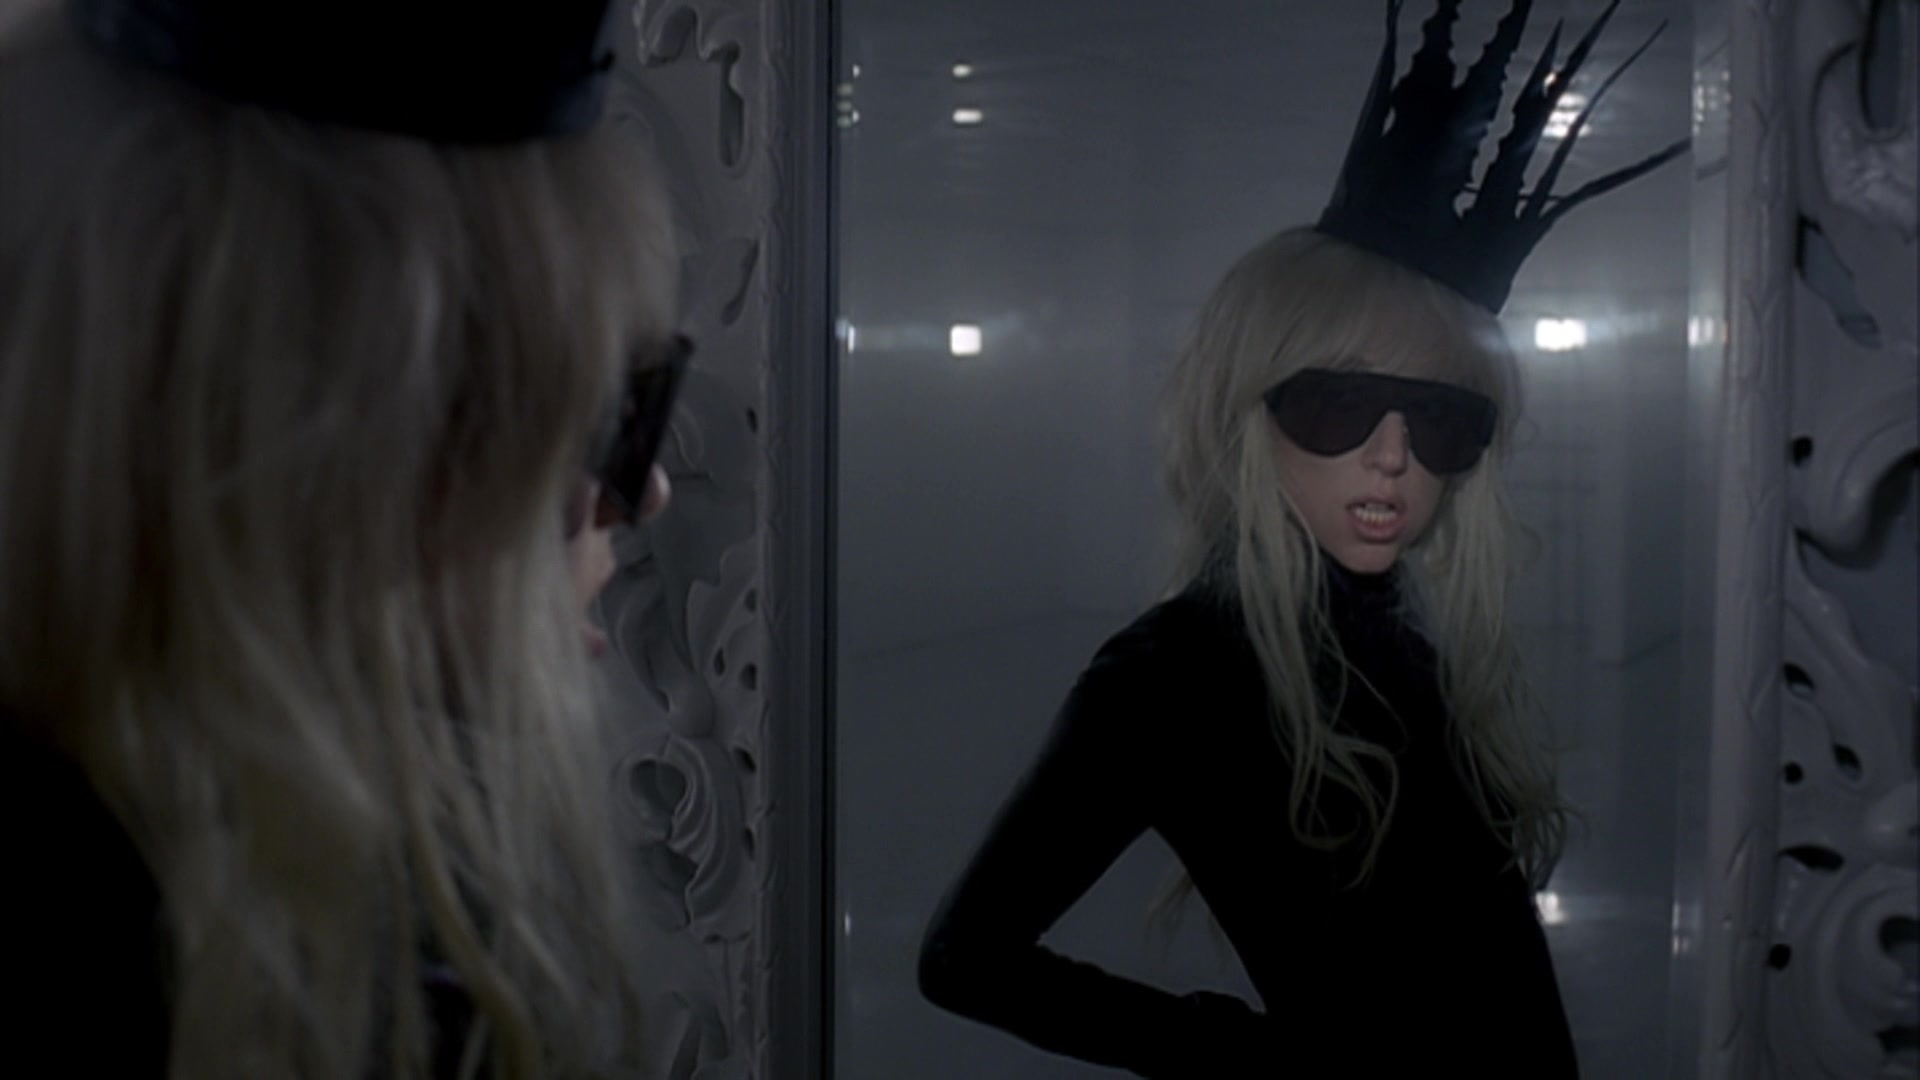 File:Lady Gaga - Bad Romance 017.jpg